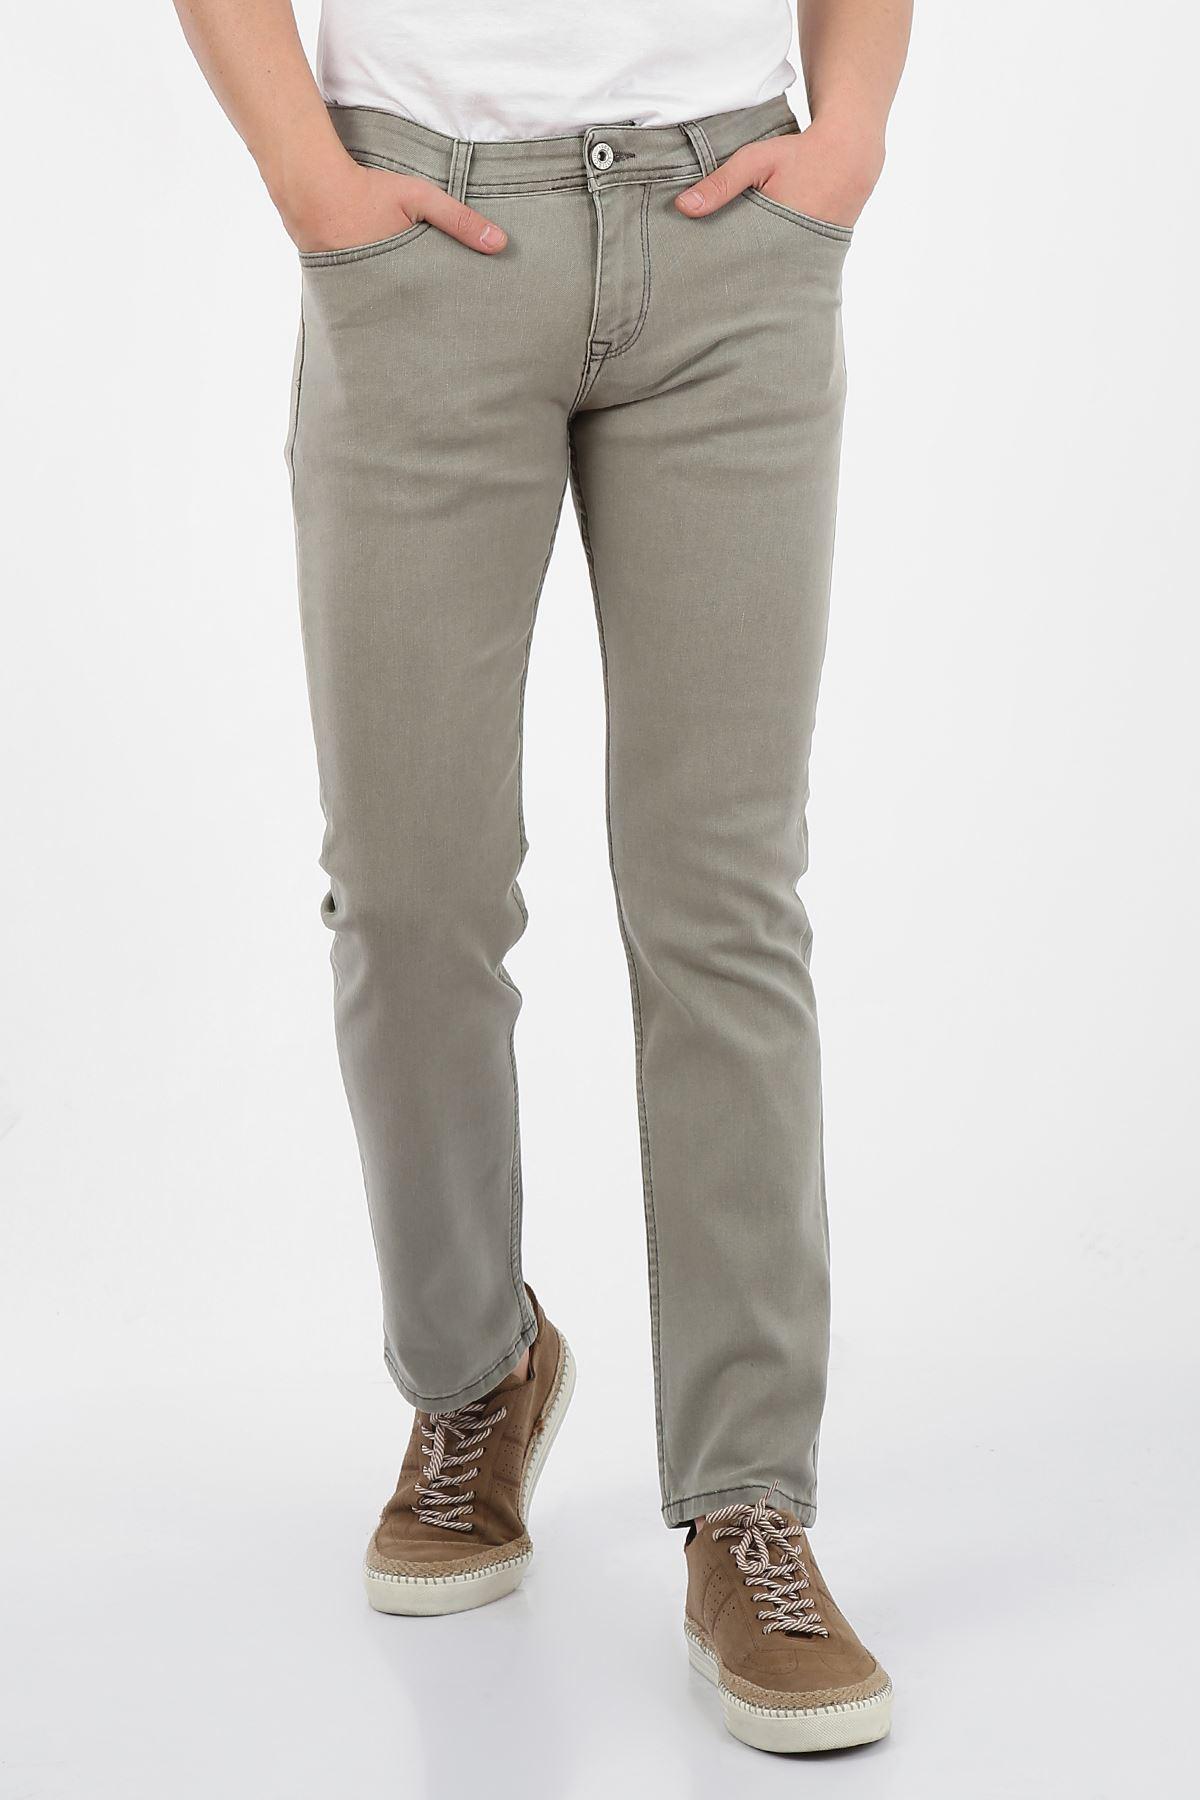 Bej Regular Fit Fermuarlı Erkek Jeans Pantolon-FARADAY